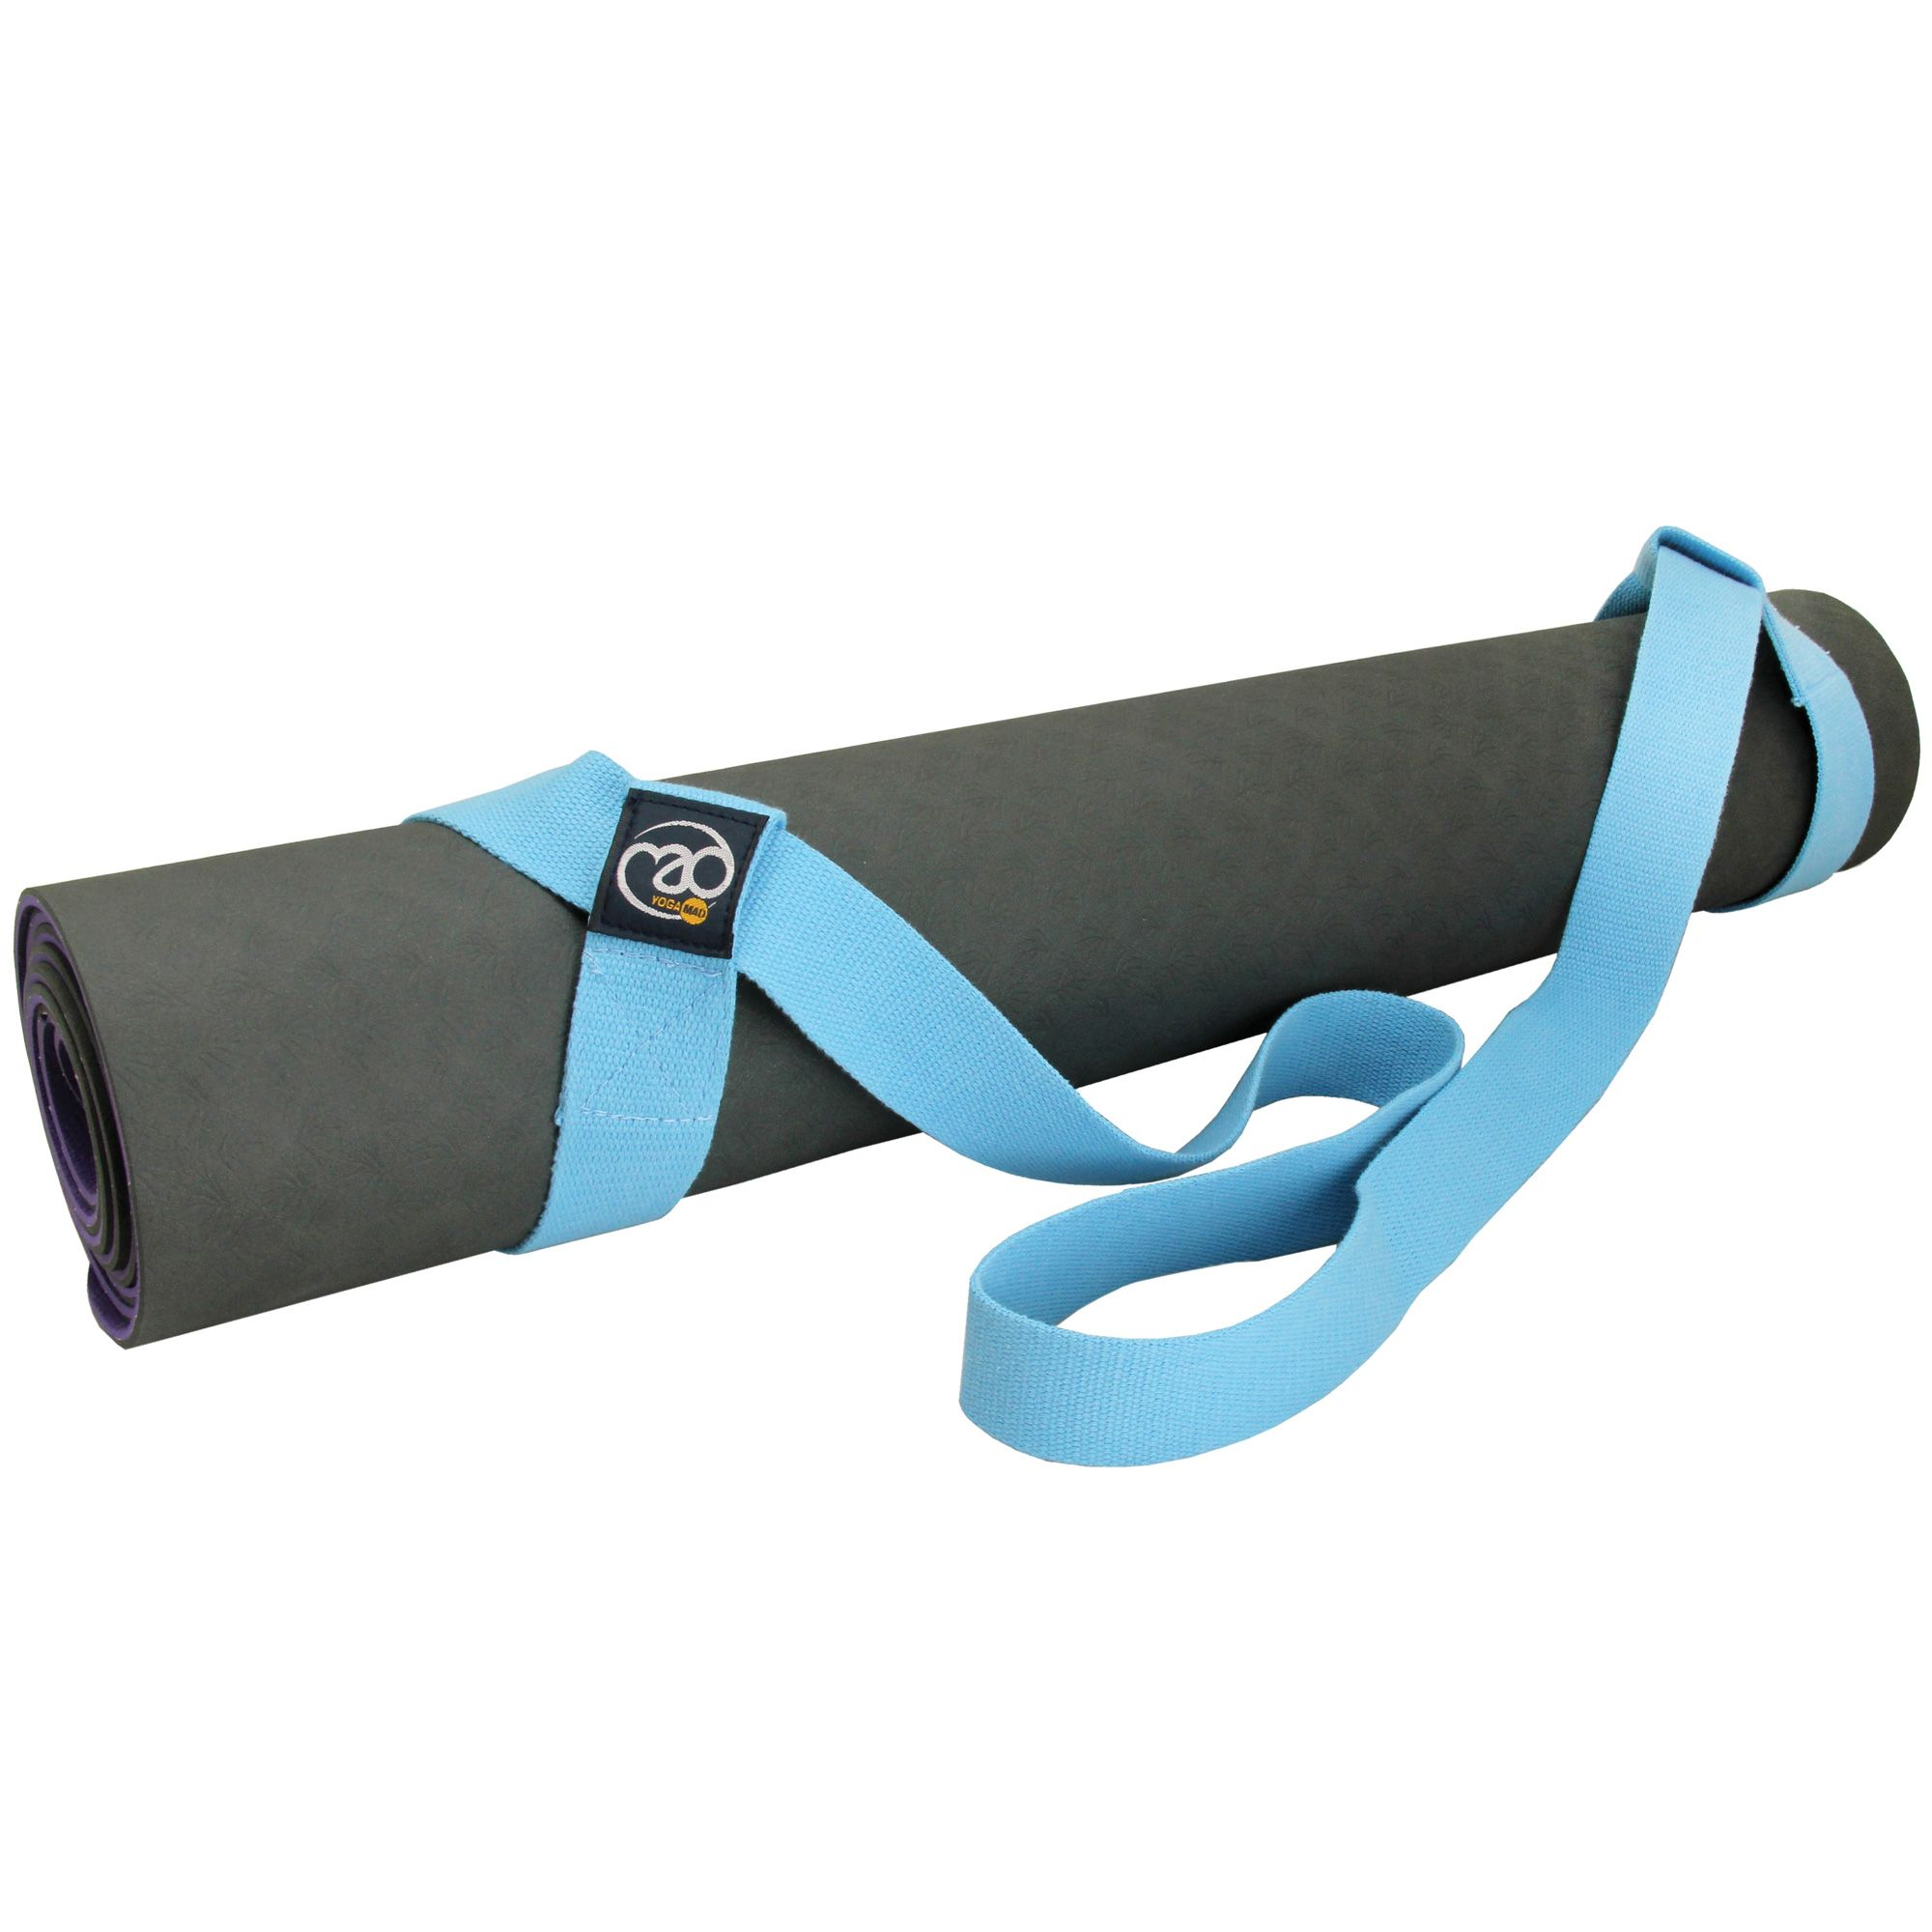 Yoga Mad Yoga Belt And Mat Carry Strap